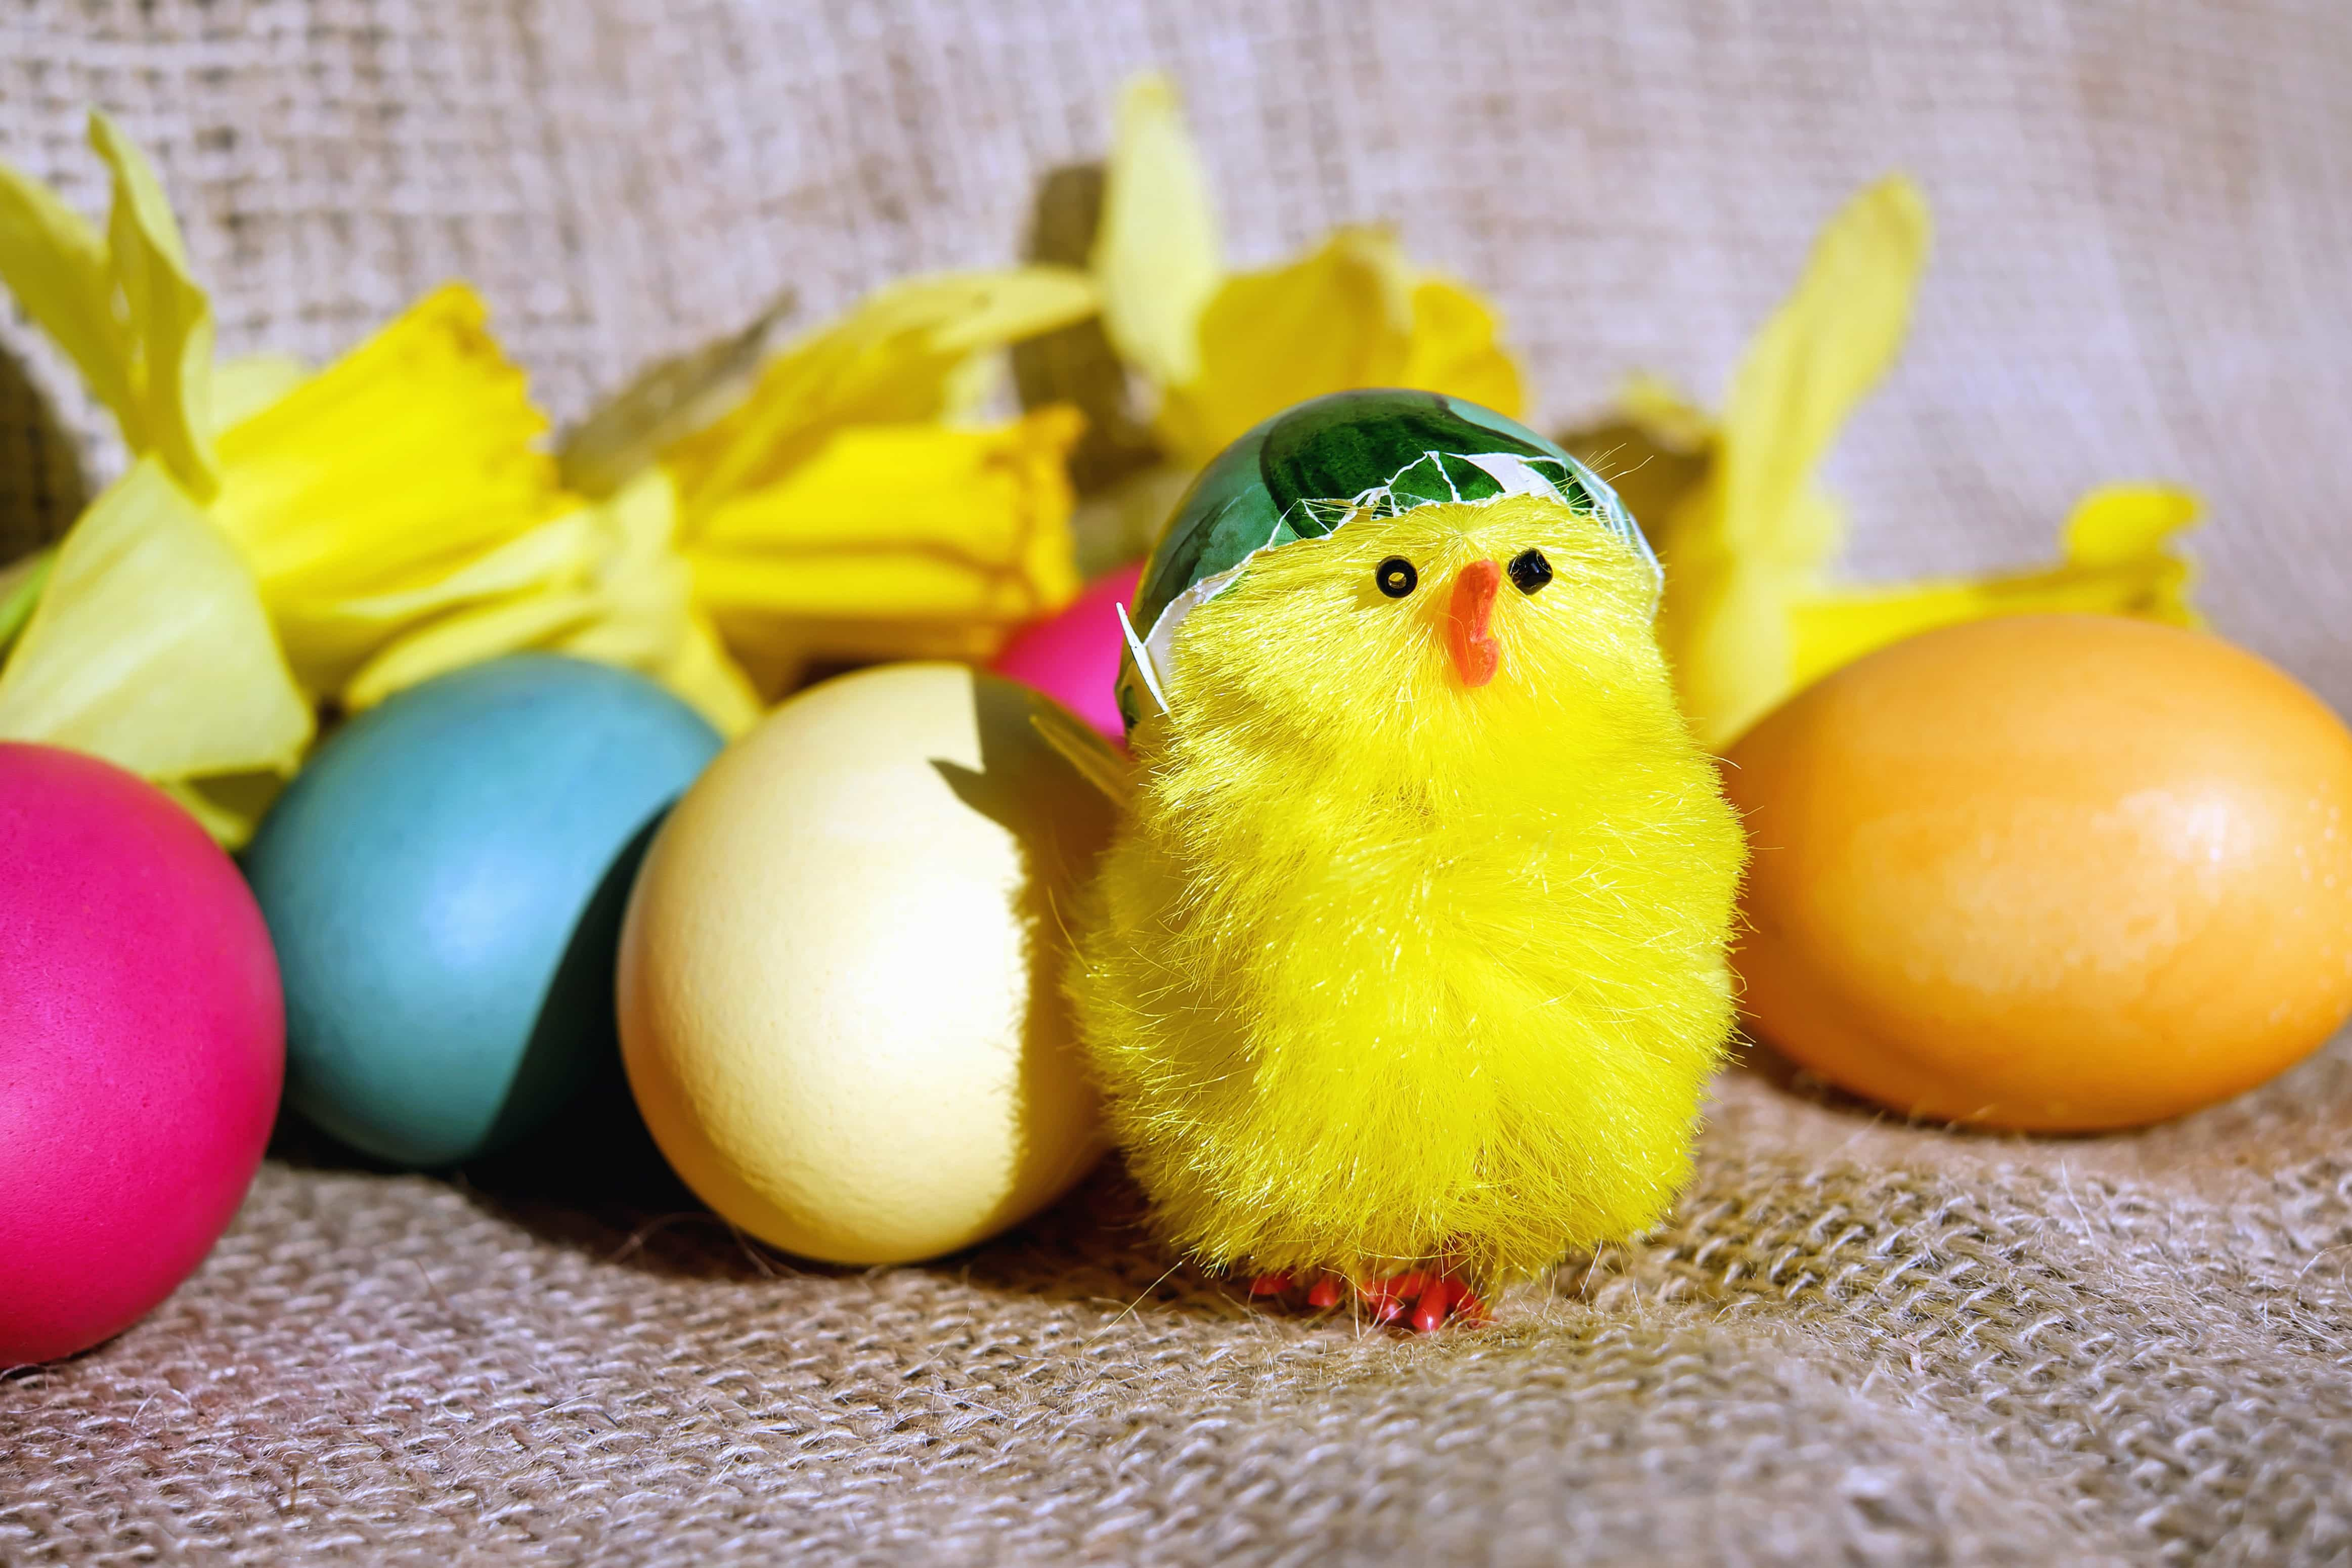 Imagen gratis: pollo, huevo, color, decoración, Pascua